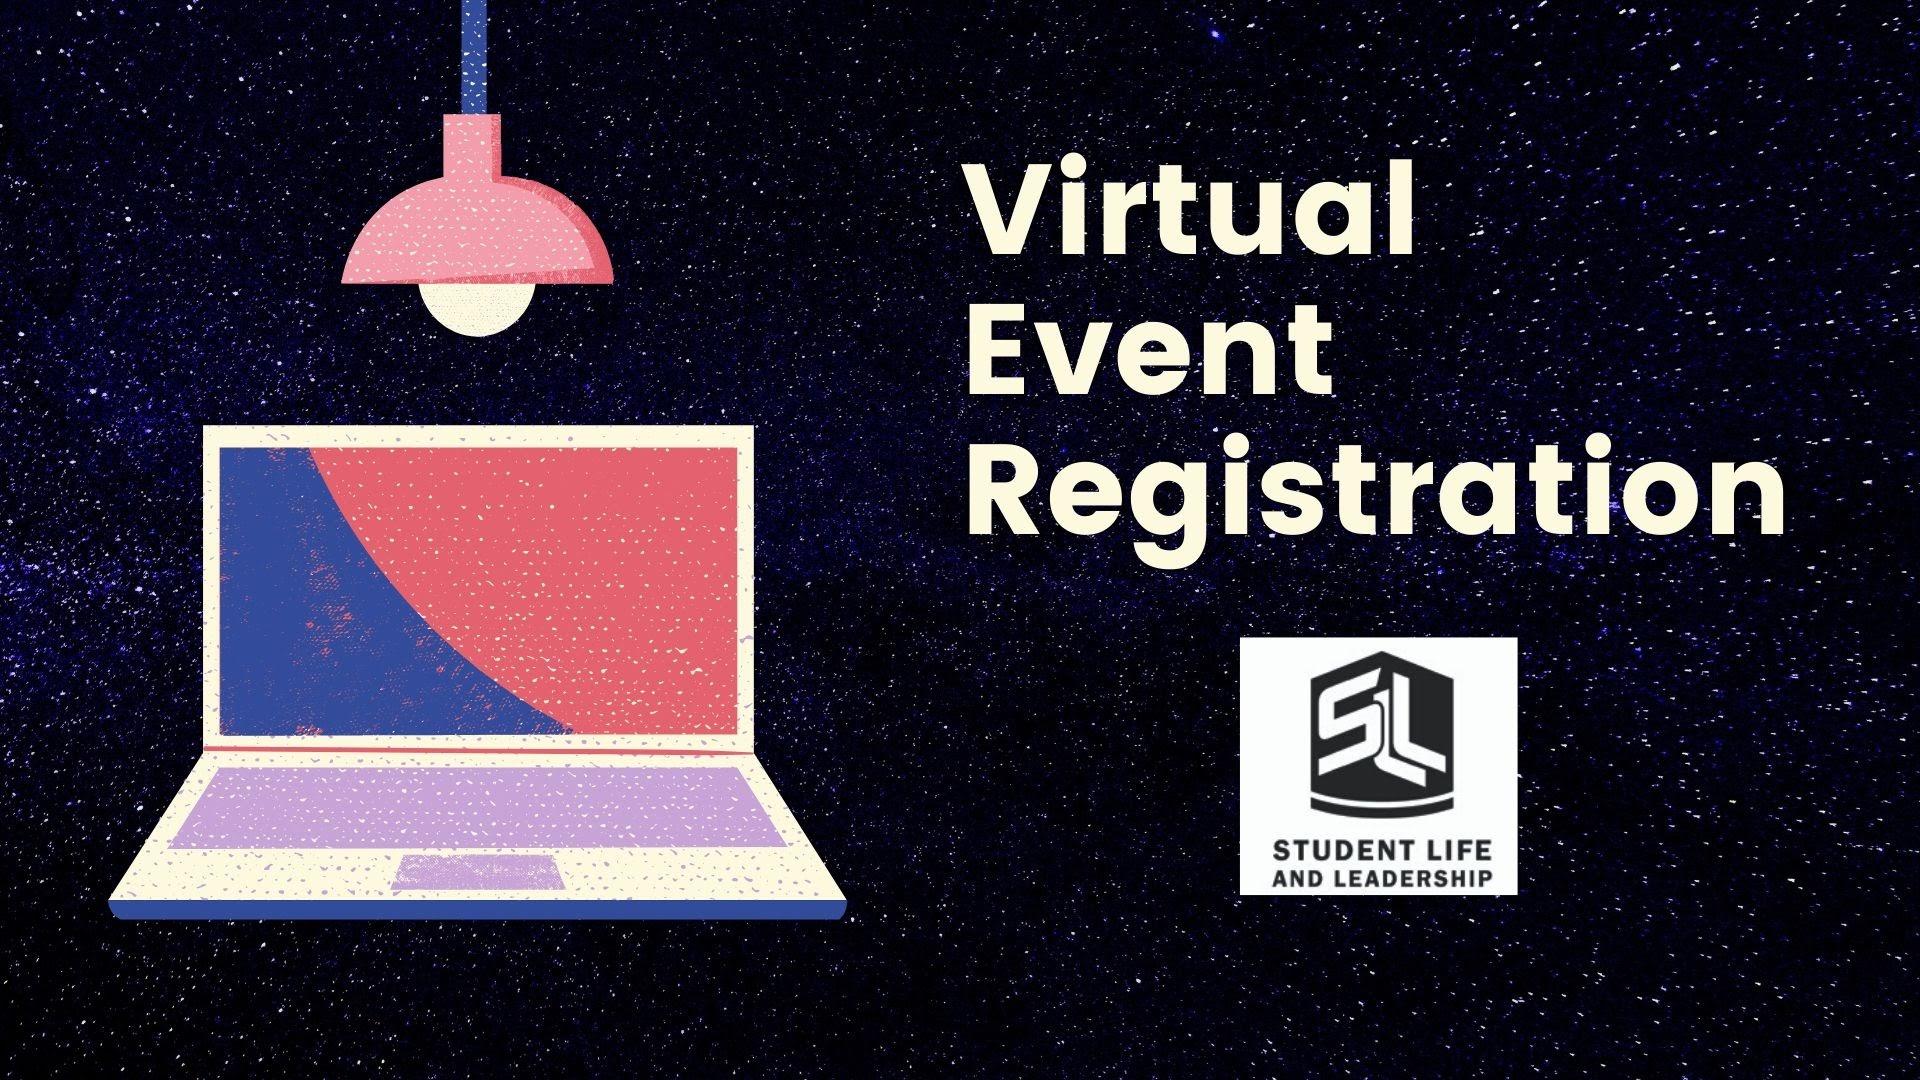 Virtual Event Registration